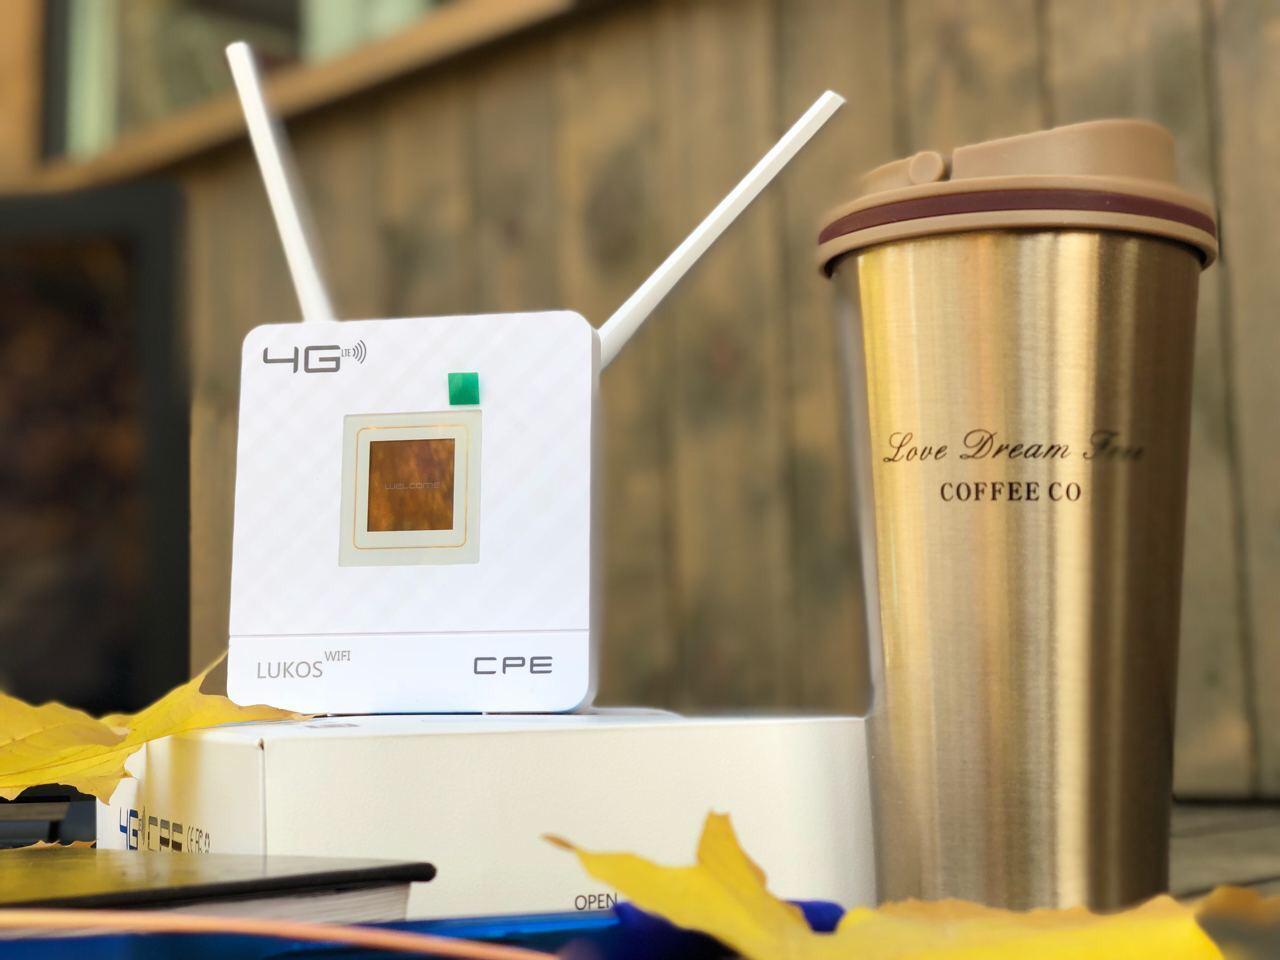 Беспроводной 4G LTE WiFi Модем Роутер CPF903 Алтел Актив Билайн Теле2 - фото 1